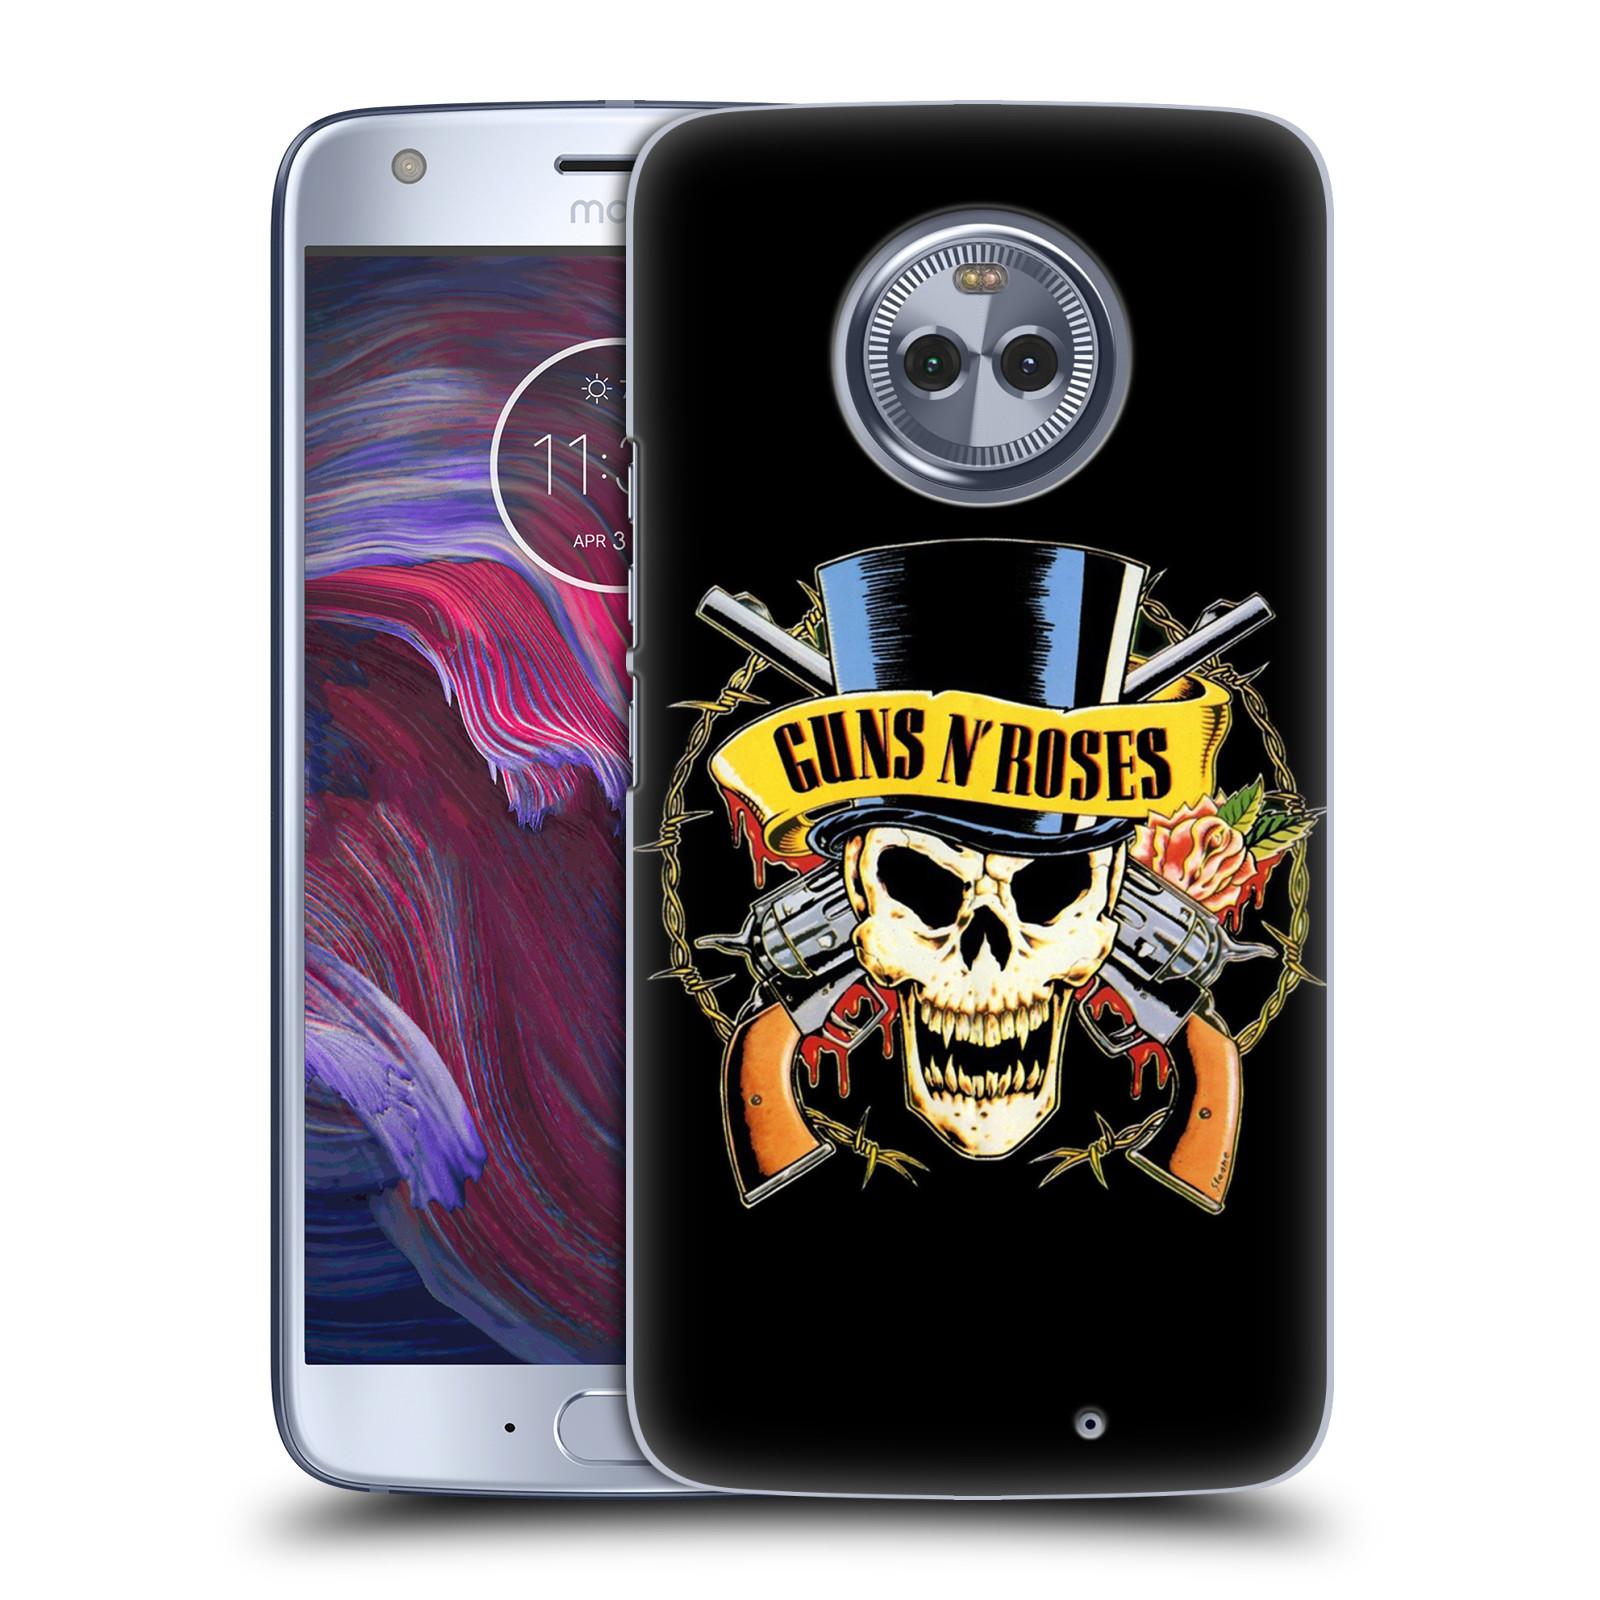 Plastové pouzdro na mobil Lenovo Moto X4 - Head Case - Guns N' Roses - Lebka